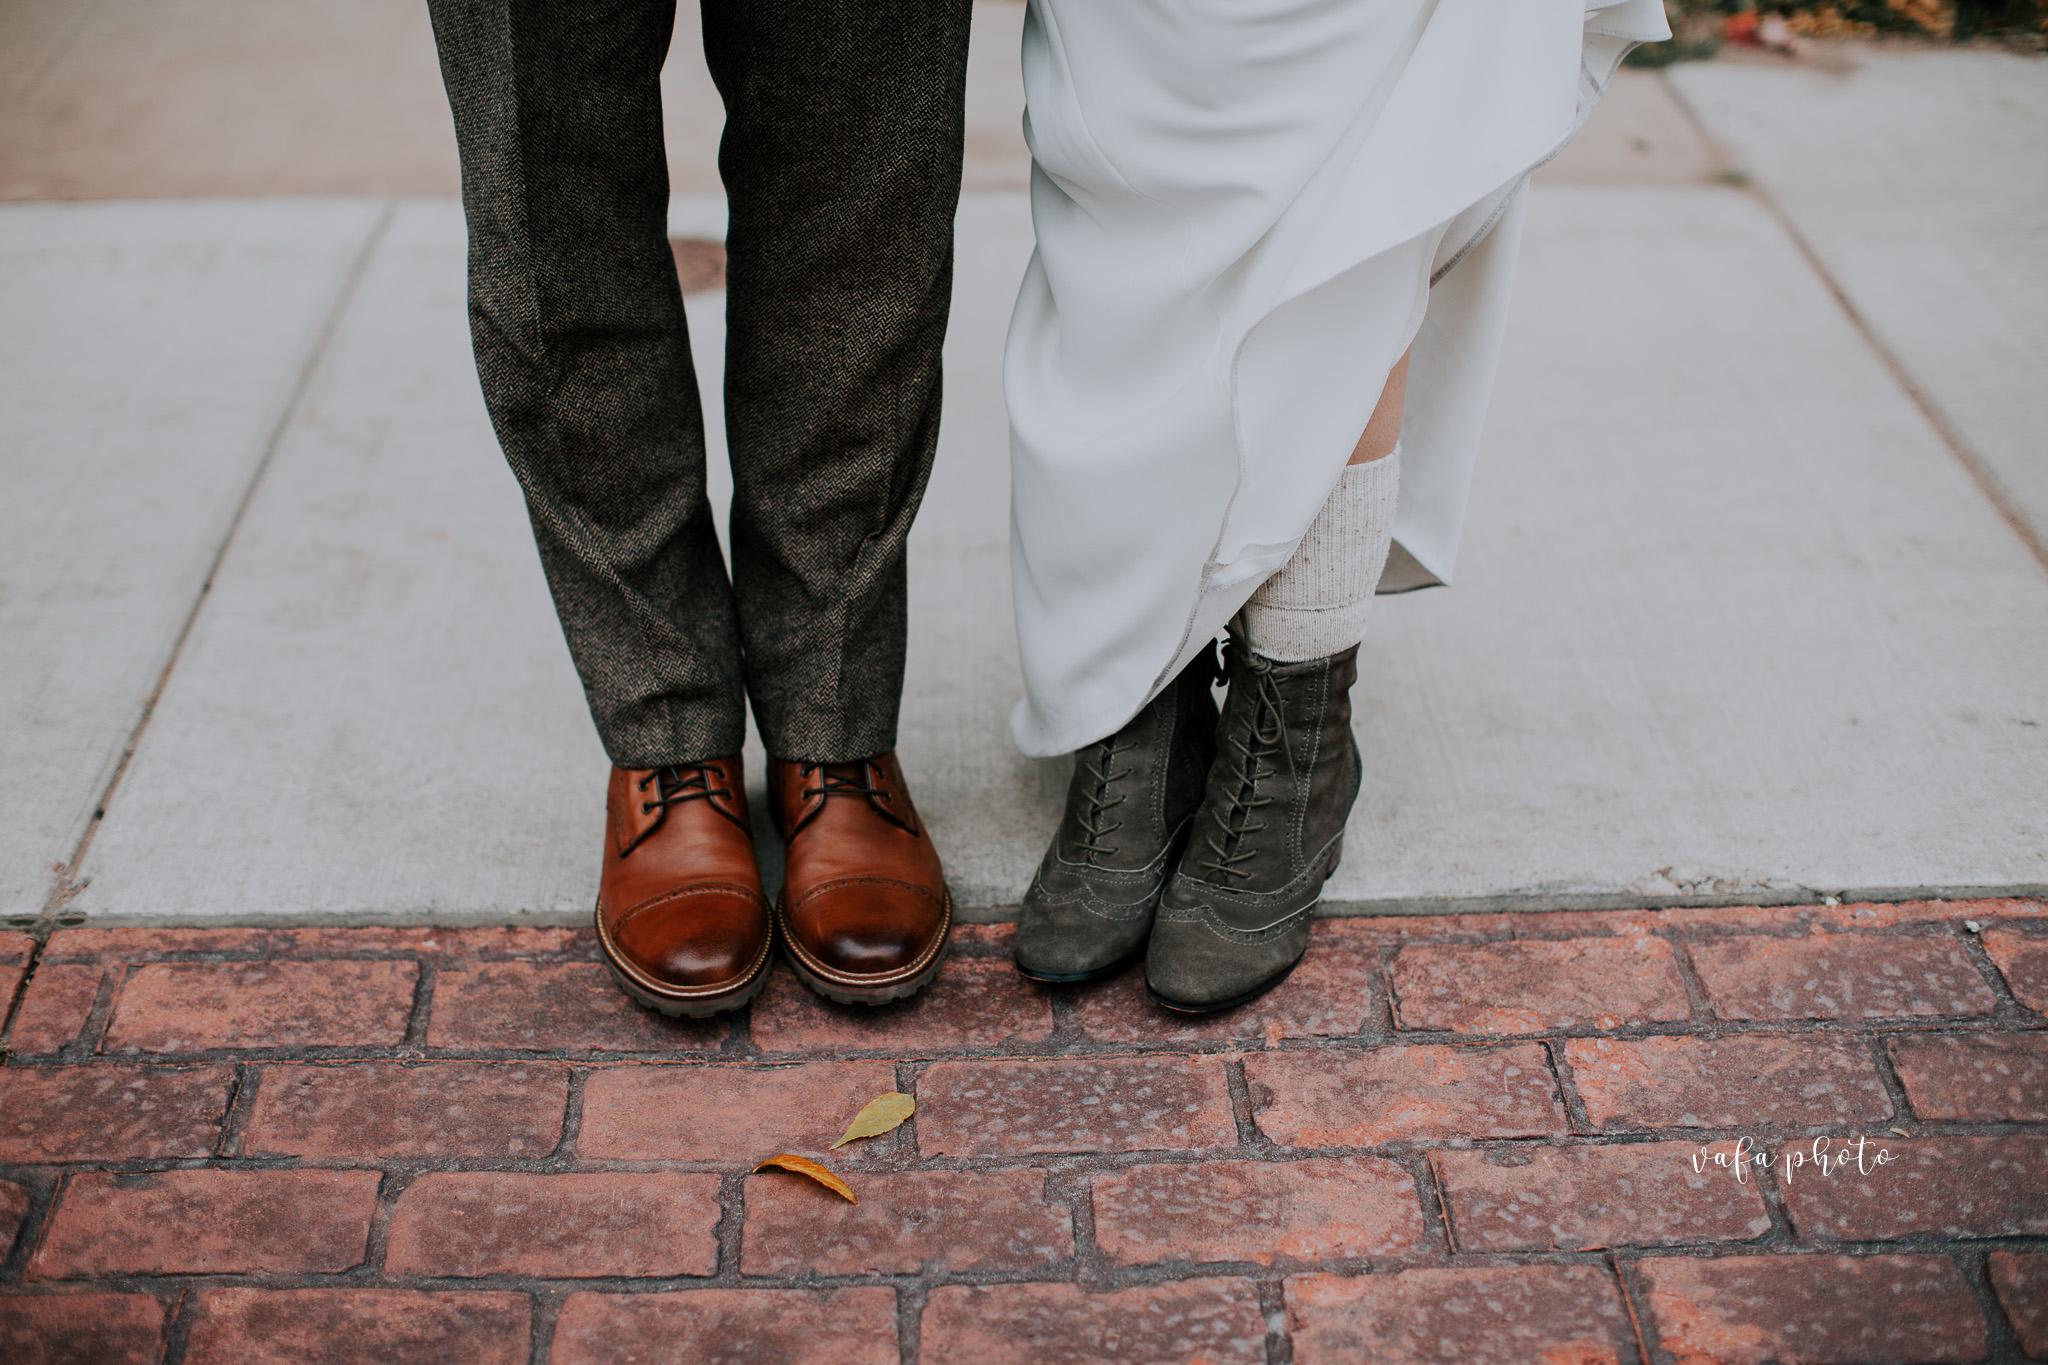 Little-Presque-Isle-Michigan-Wedding-Kim-Kyle-Vafa-Photo-576.jpg